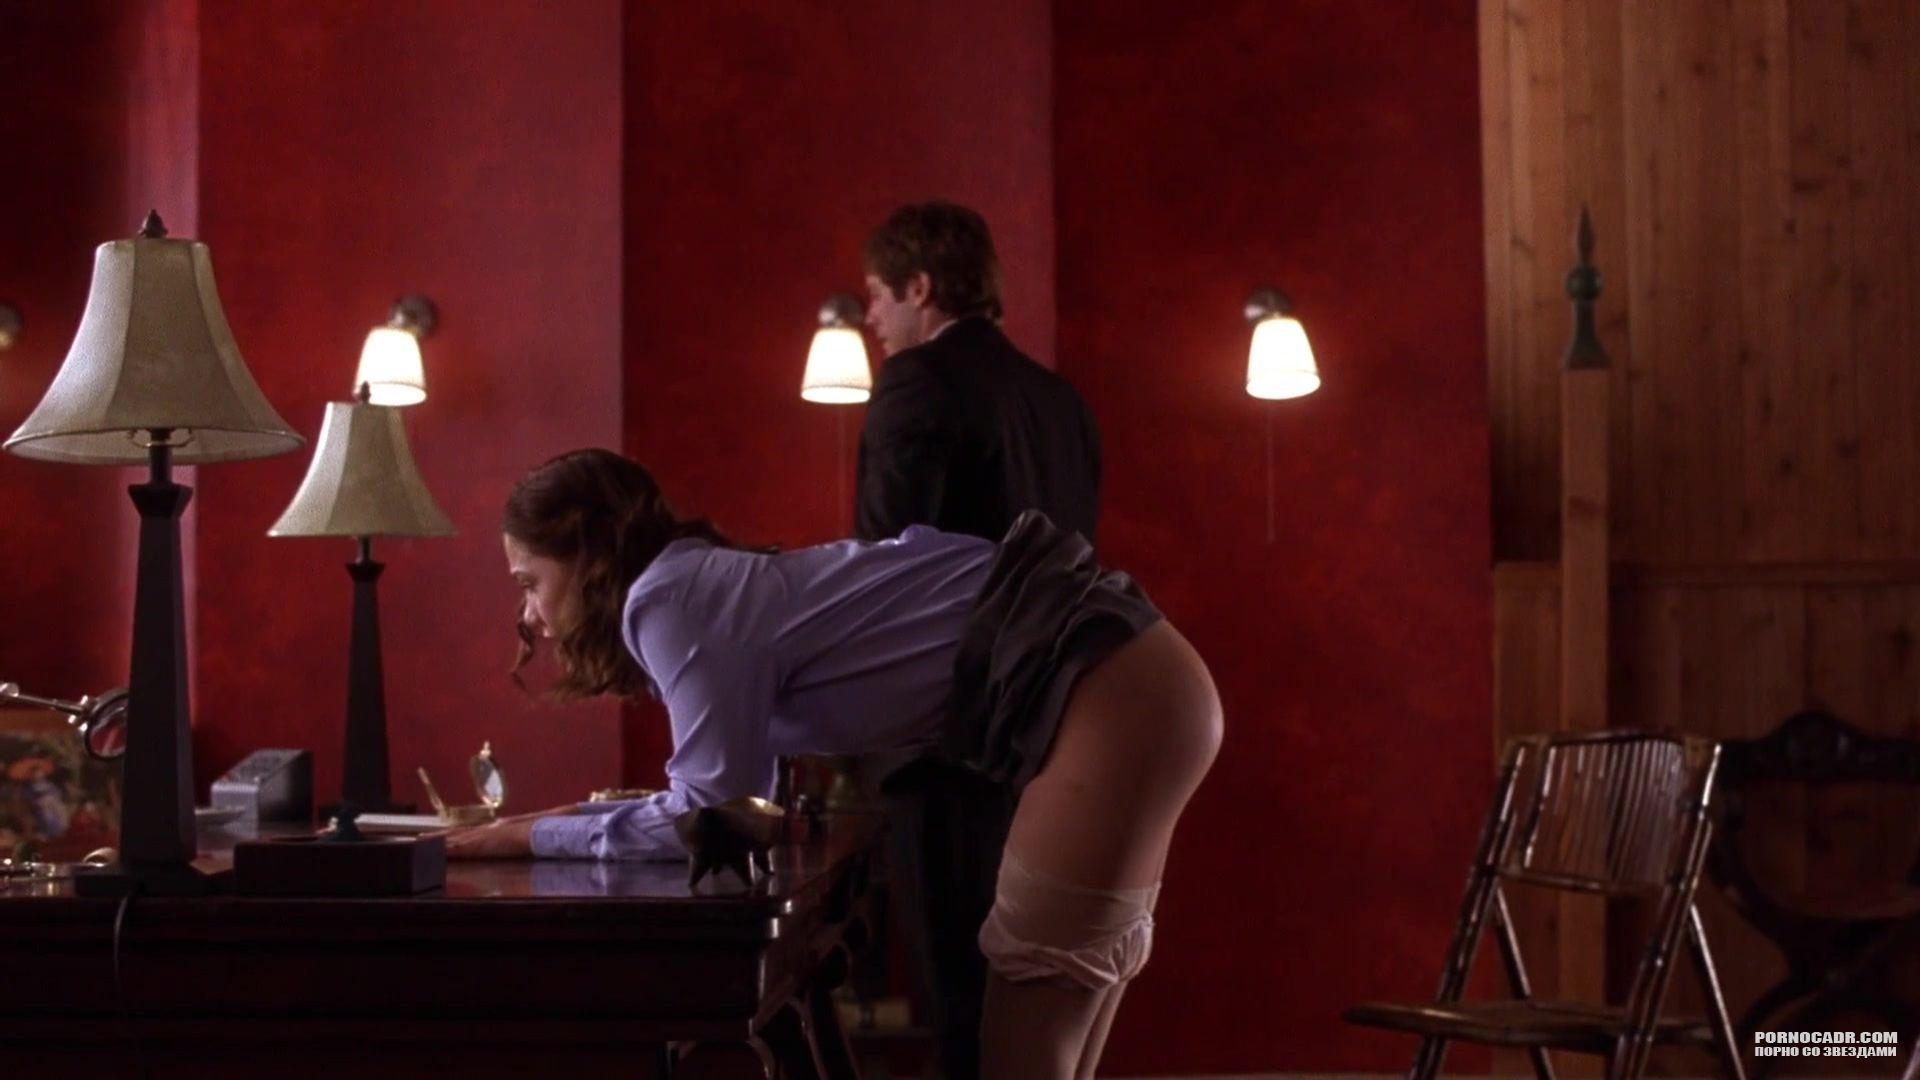 Hottest picture sex scenes